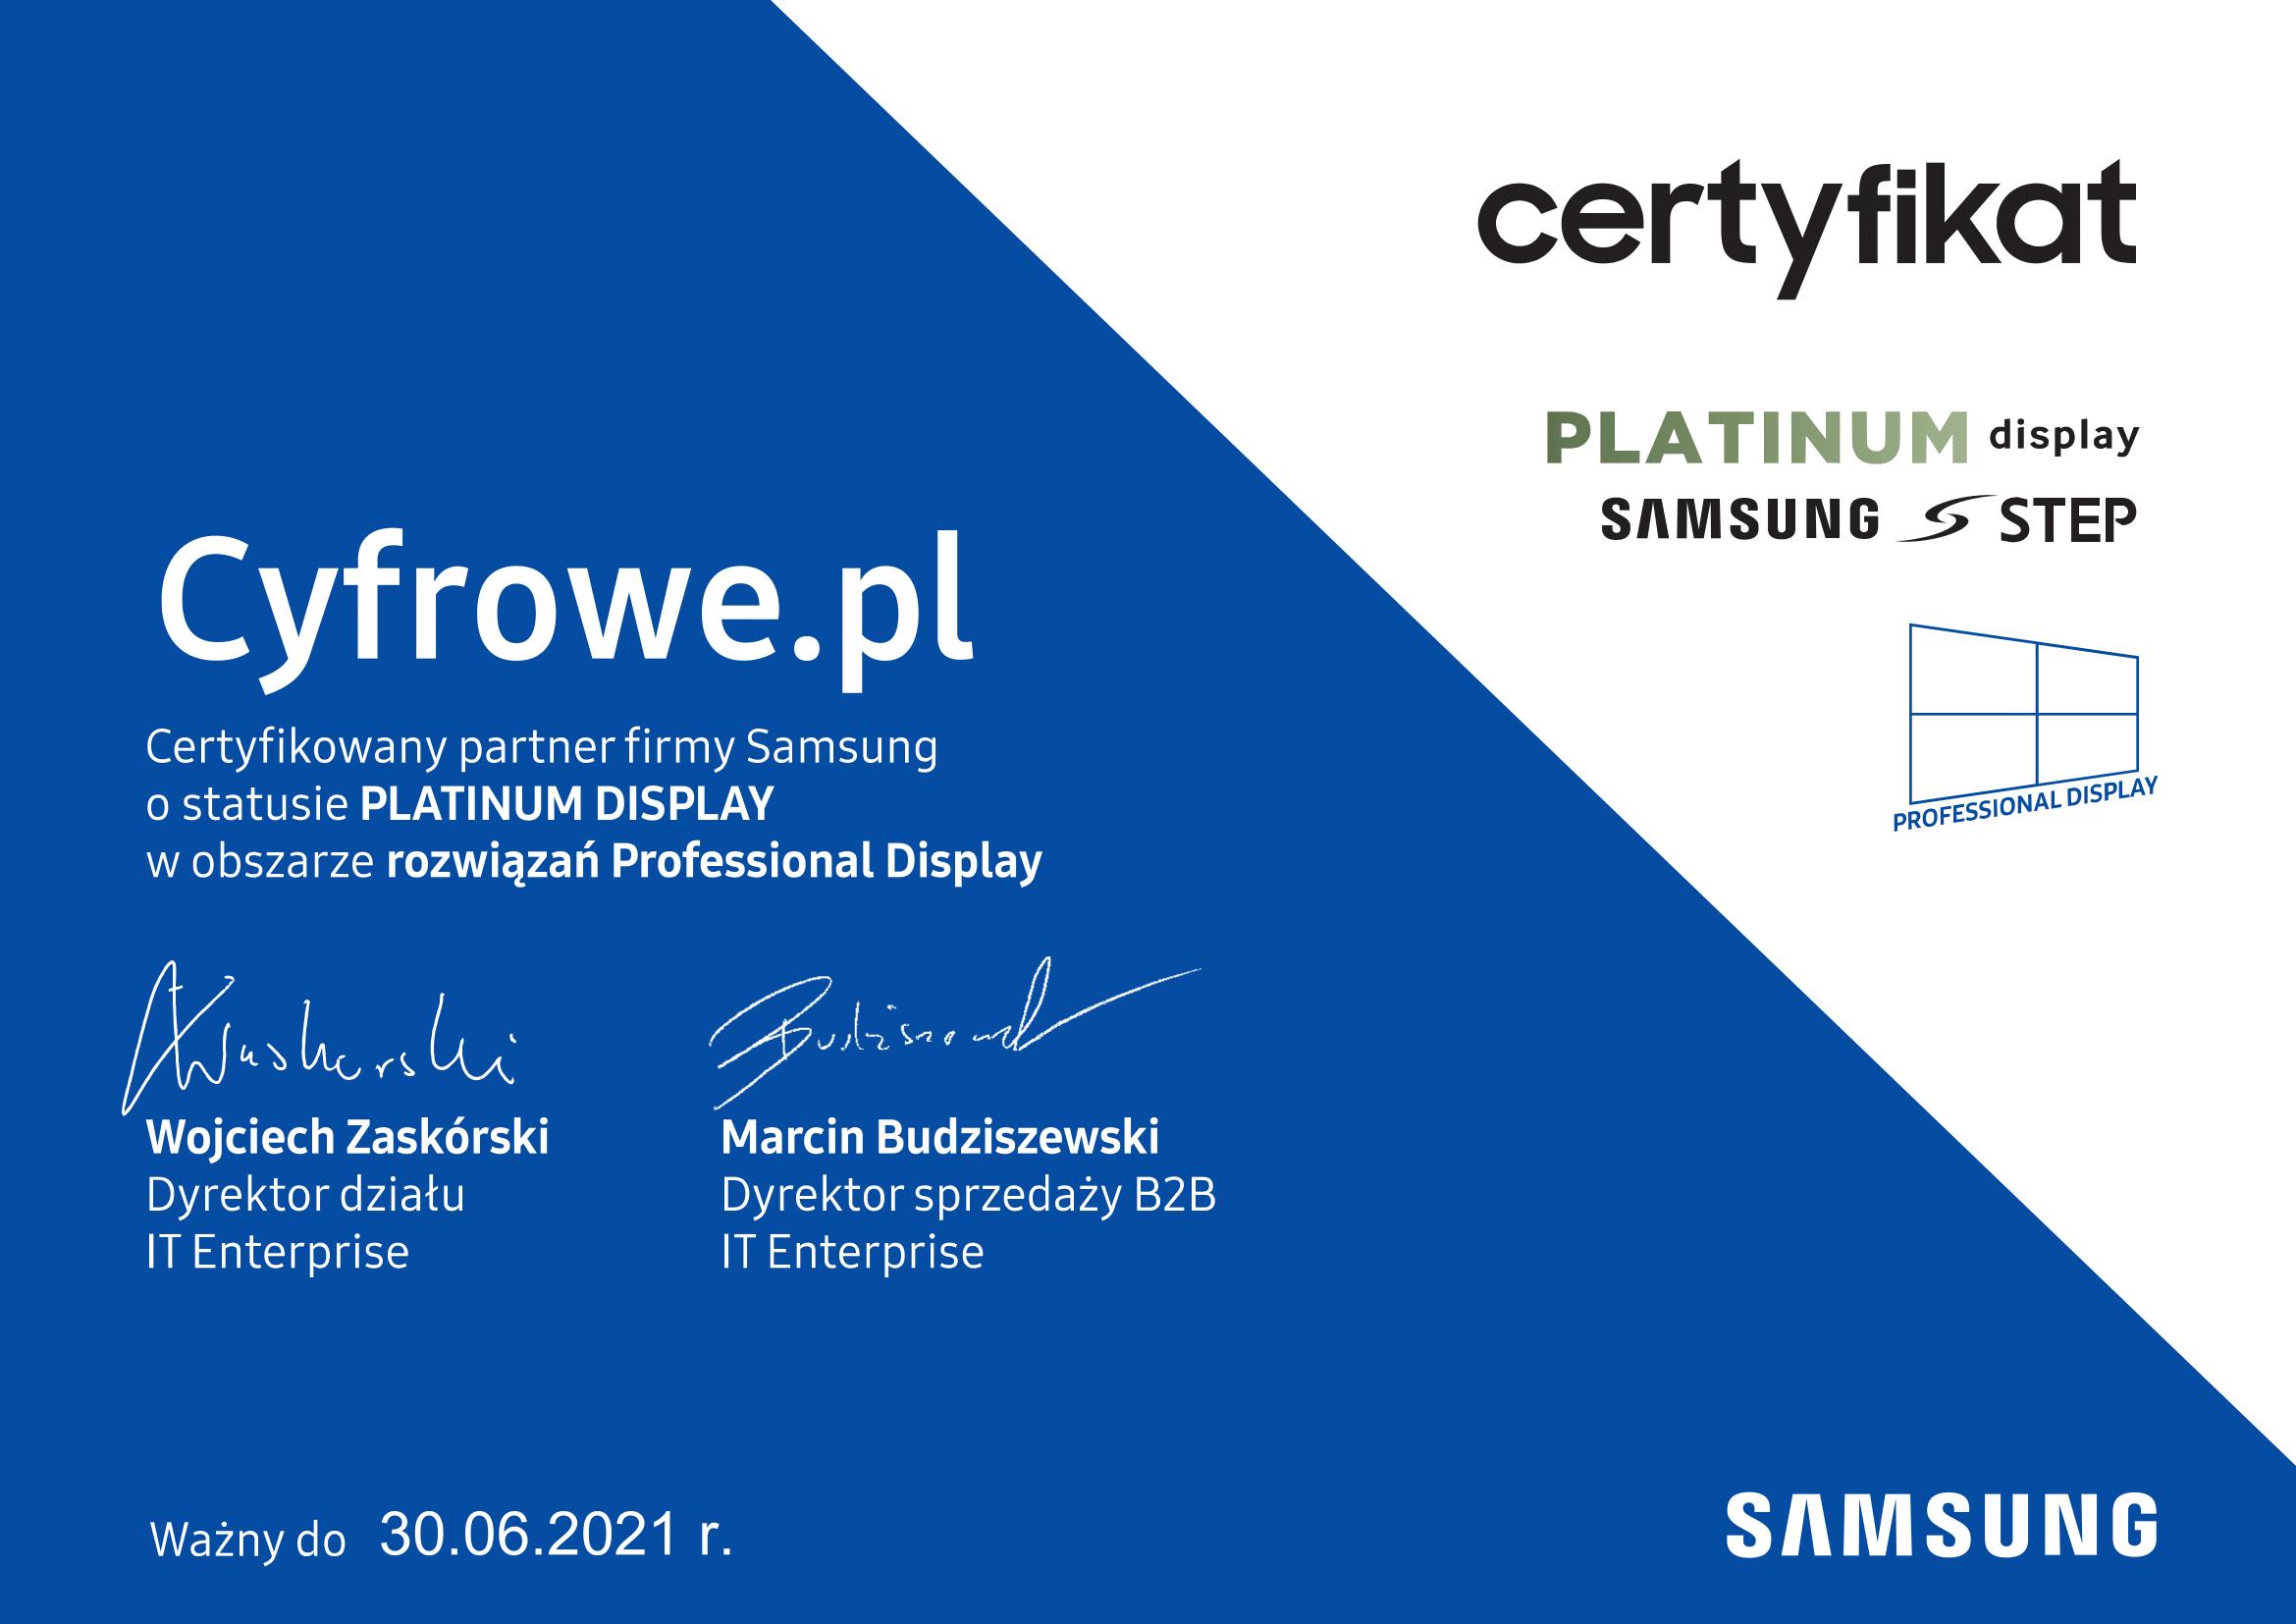 CyfroweAV Certyfikat Samsung